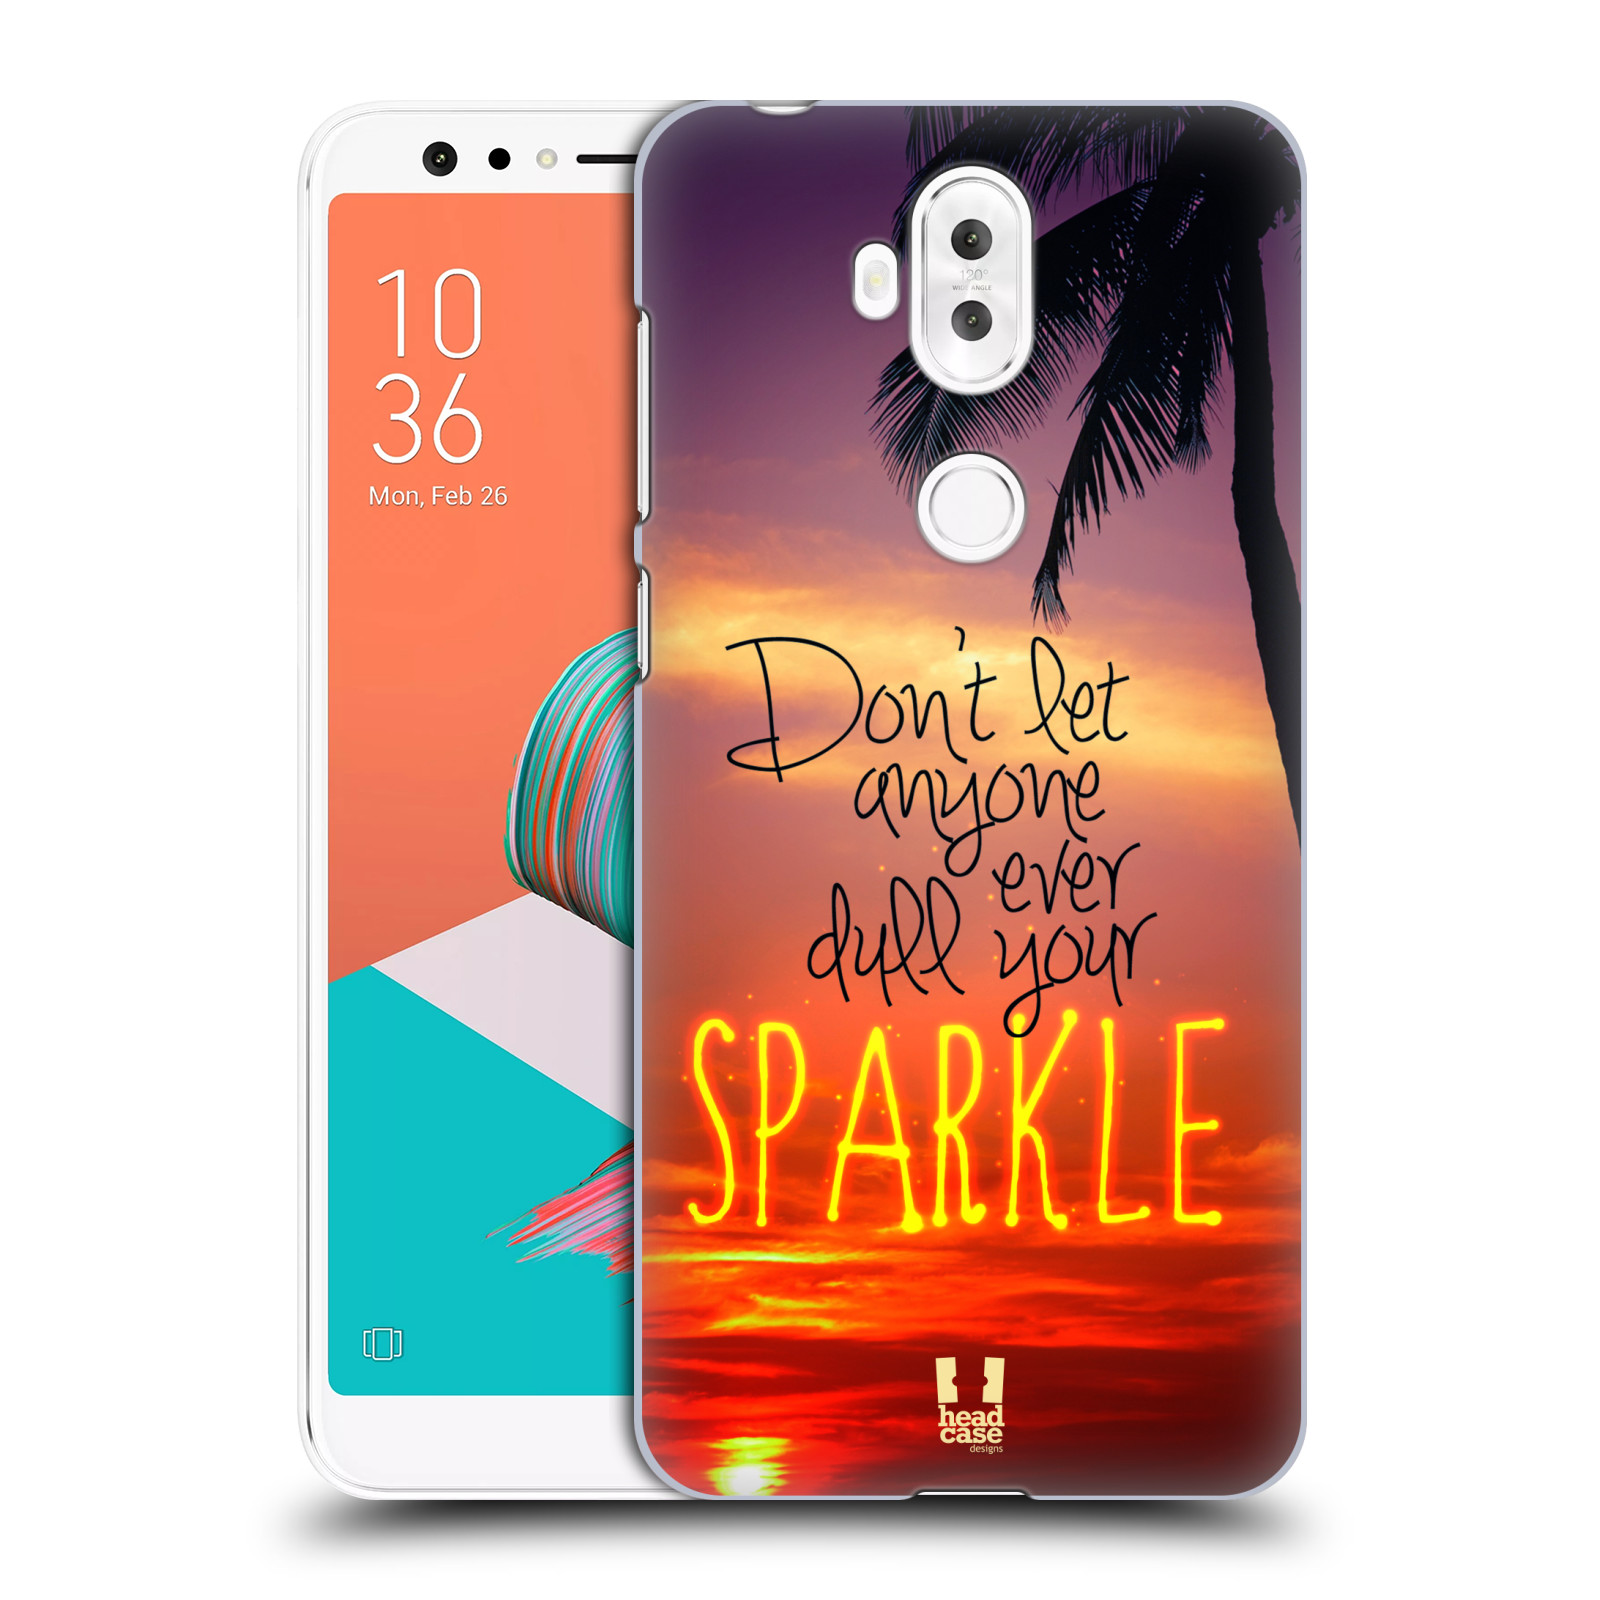 Plastové pouzdro na mobil Asus ZenFone 5 Lite ZC600KL - Head Case - SPARKLE (Plastový kryt či obal na mobilní telefon Asus ZenFone 5 Lite (ZC600KL) s motivem SPARKLE)